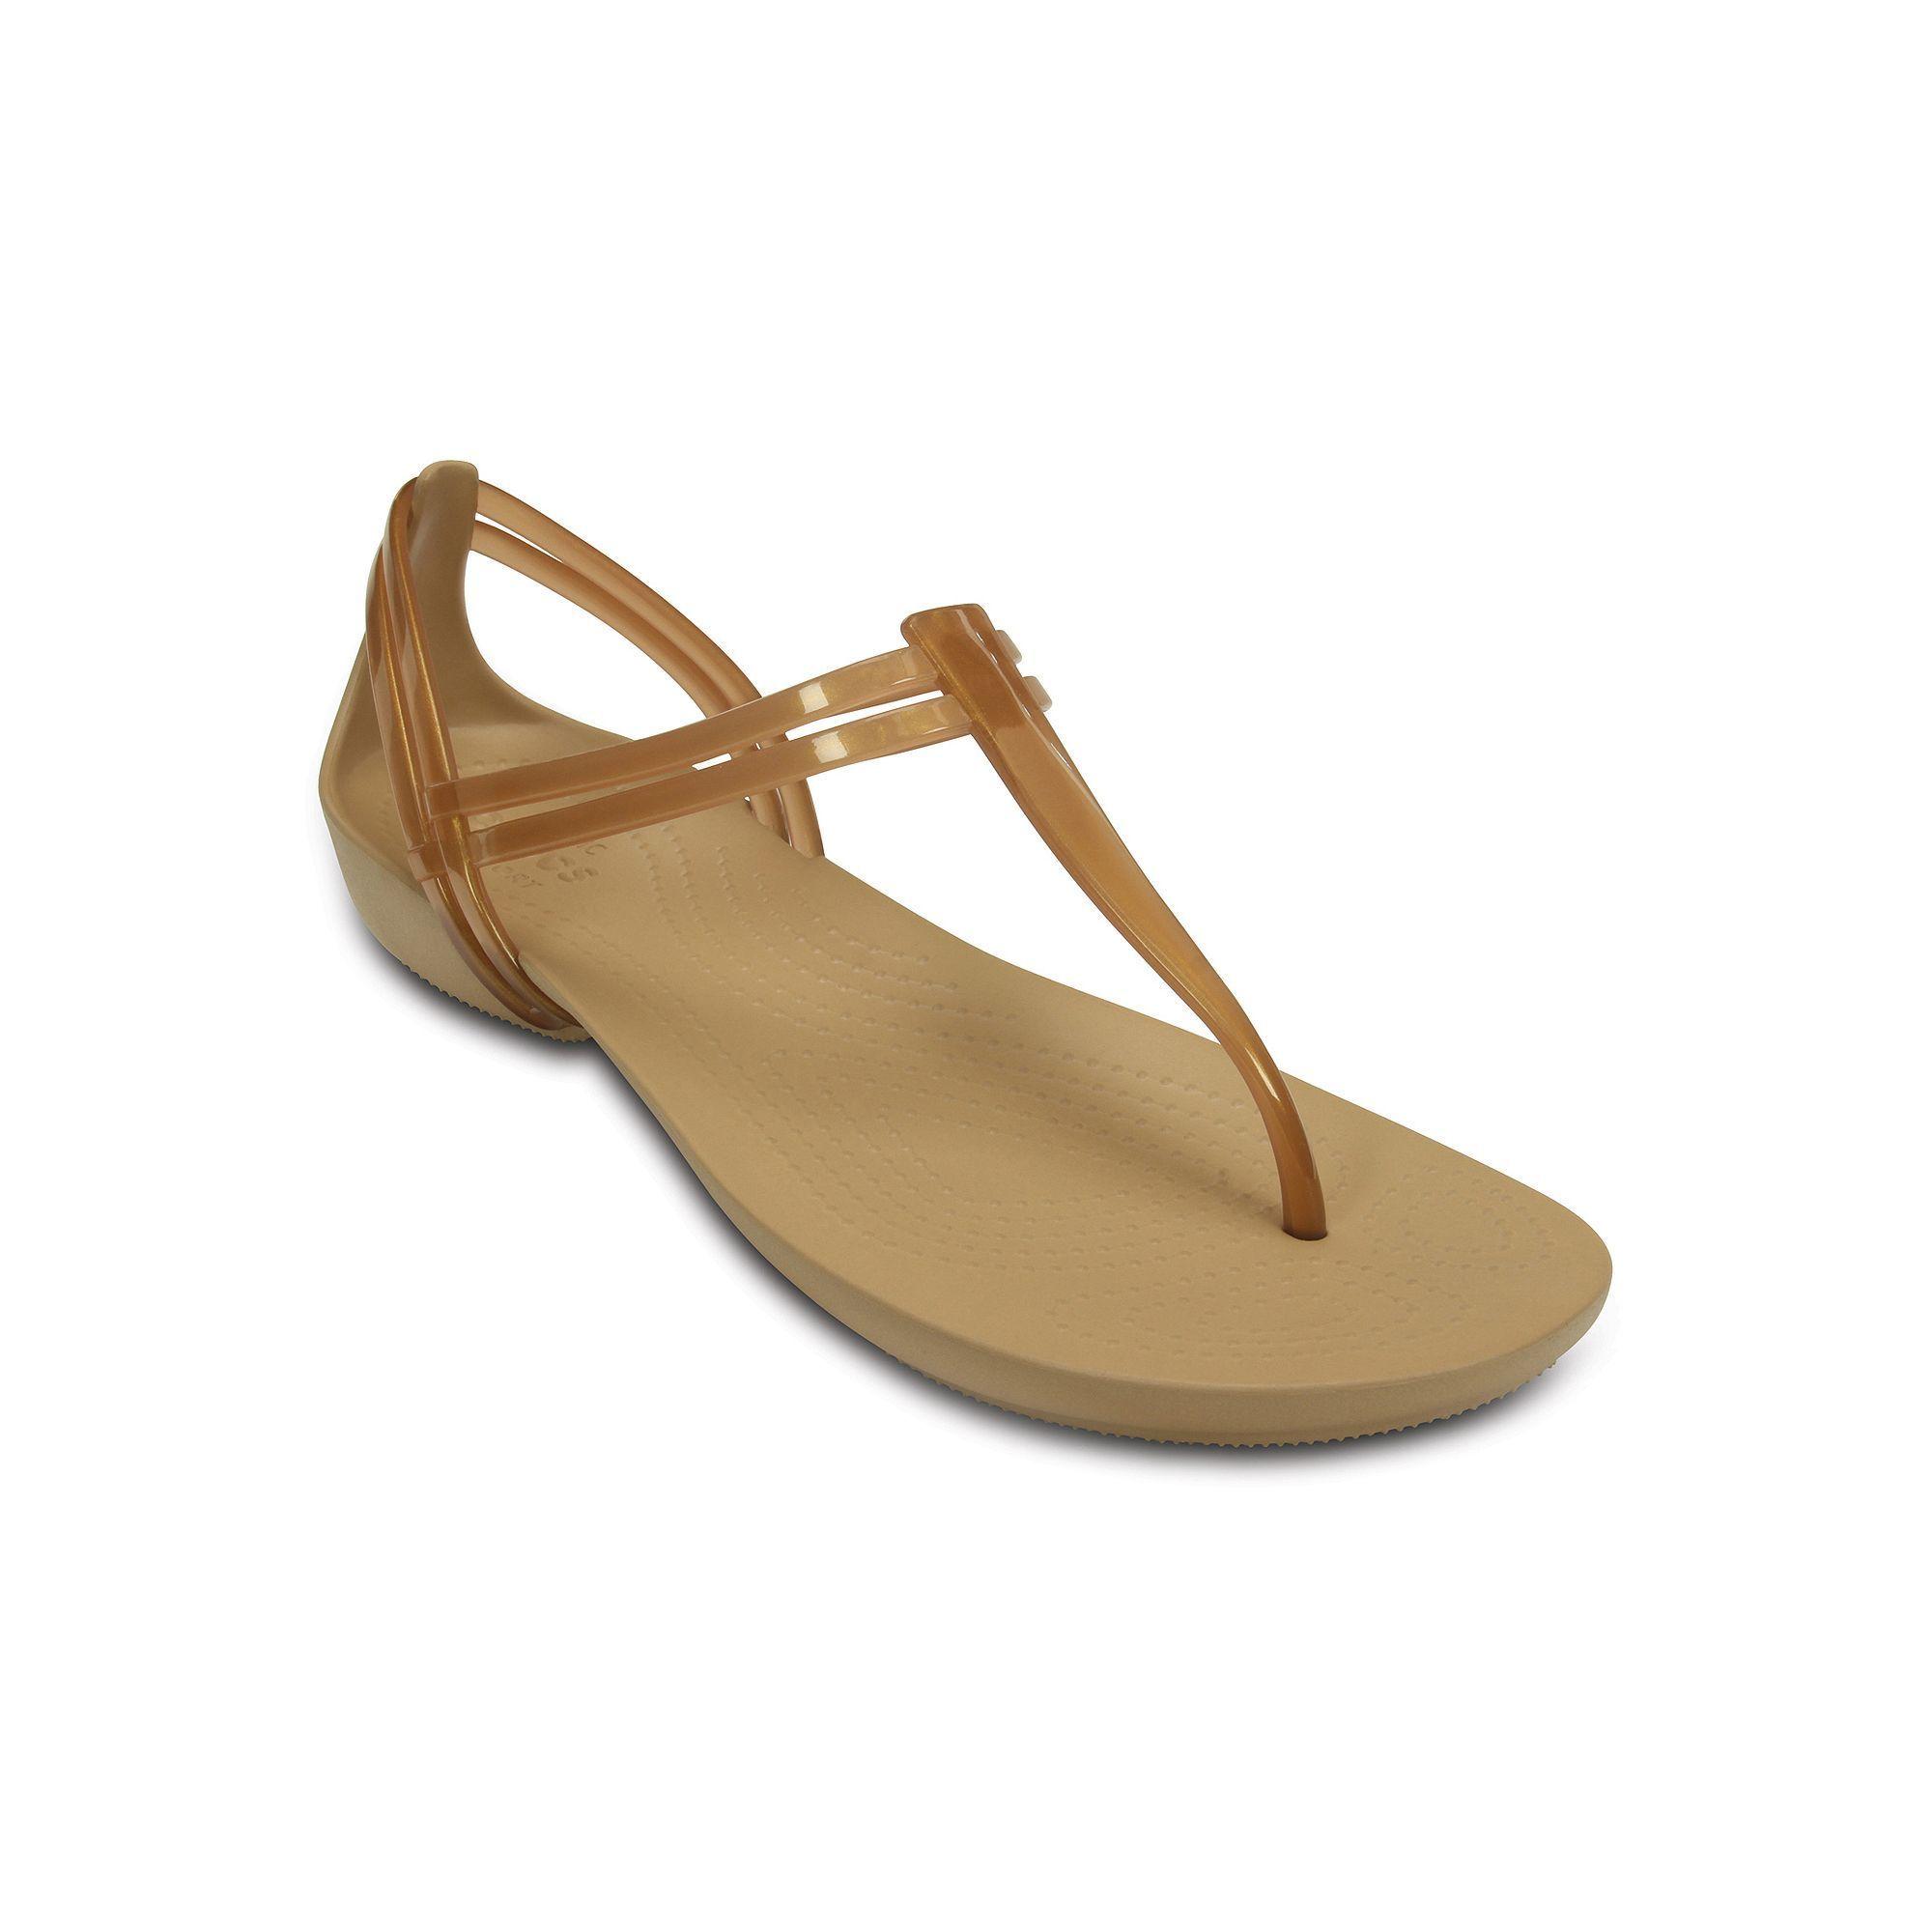 Crocs Isabella Tstrap Sandals Bronze Women s shoescrocs hair dryercrocs toddler rain bootsNew Arrival